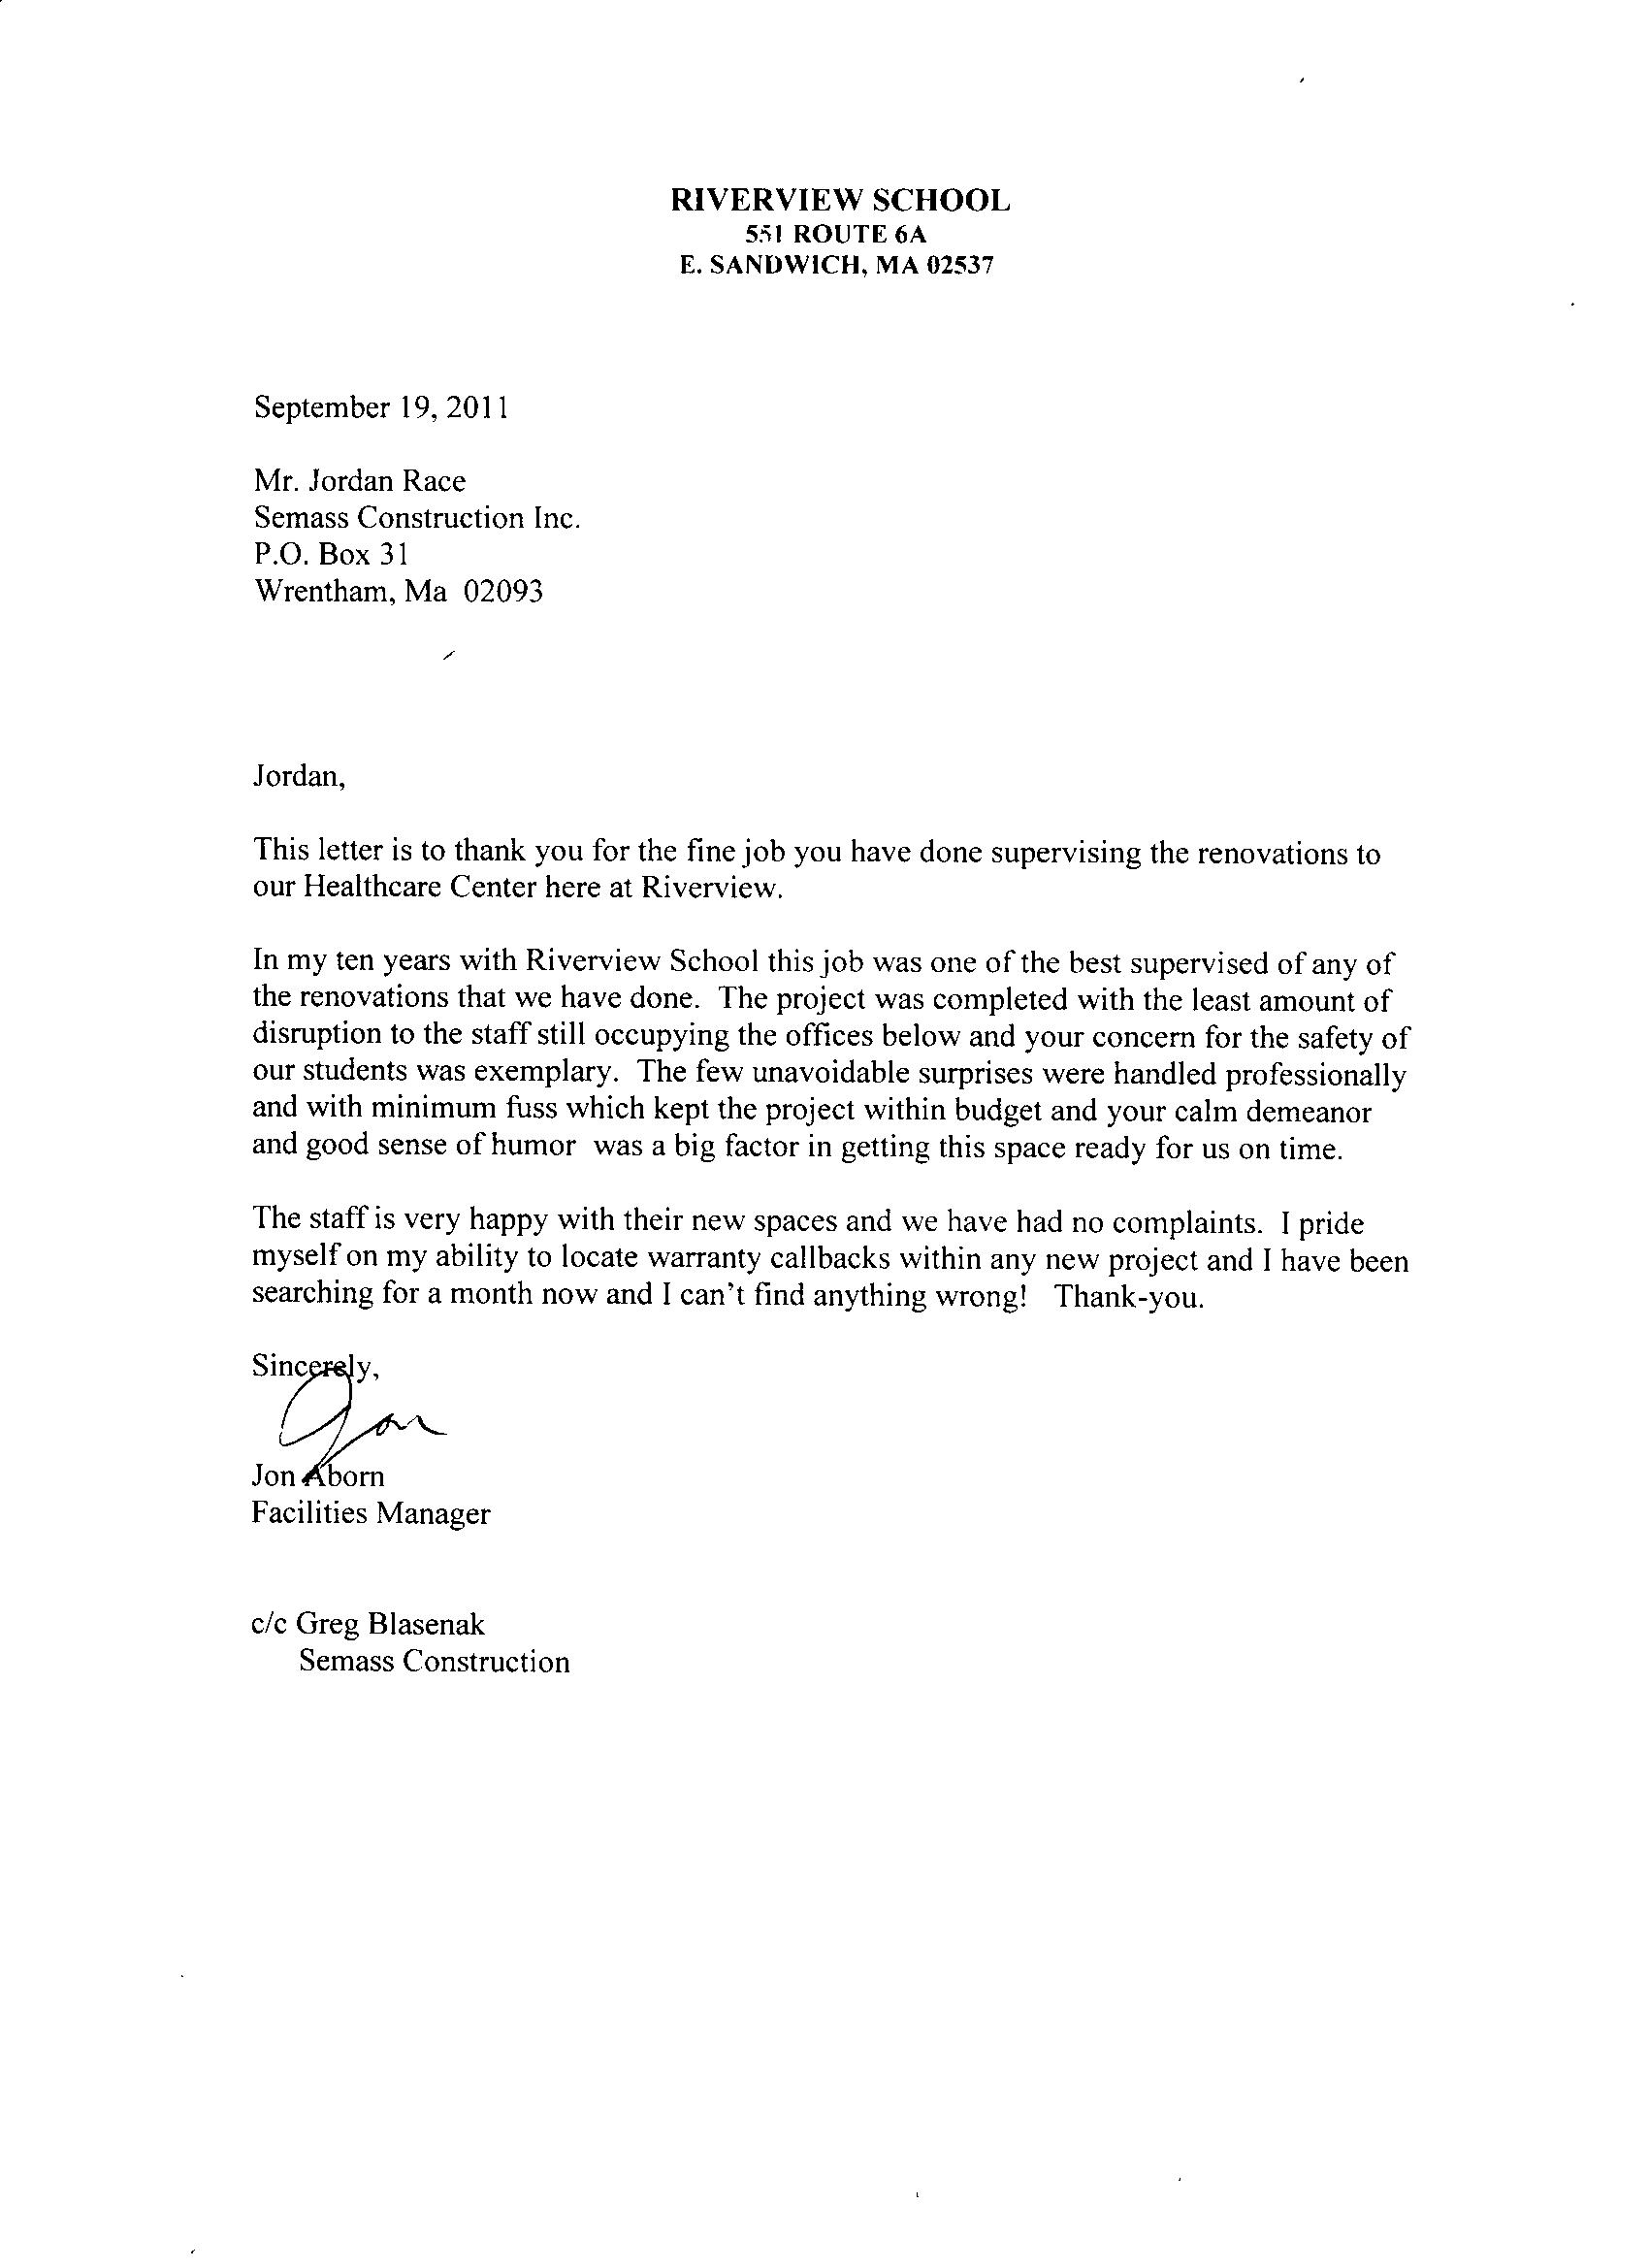 construction warranty letter